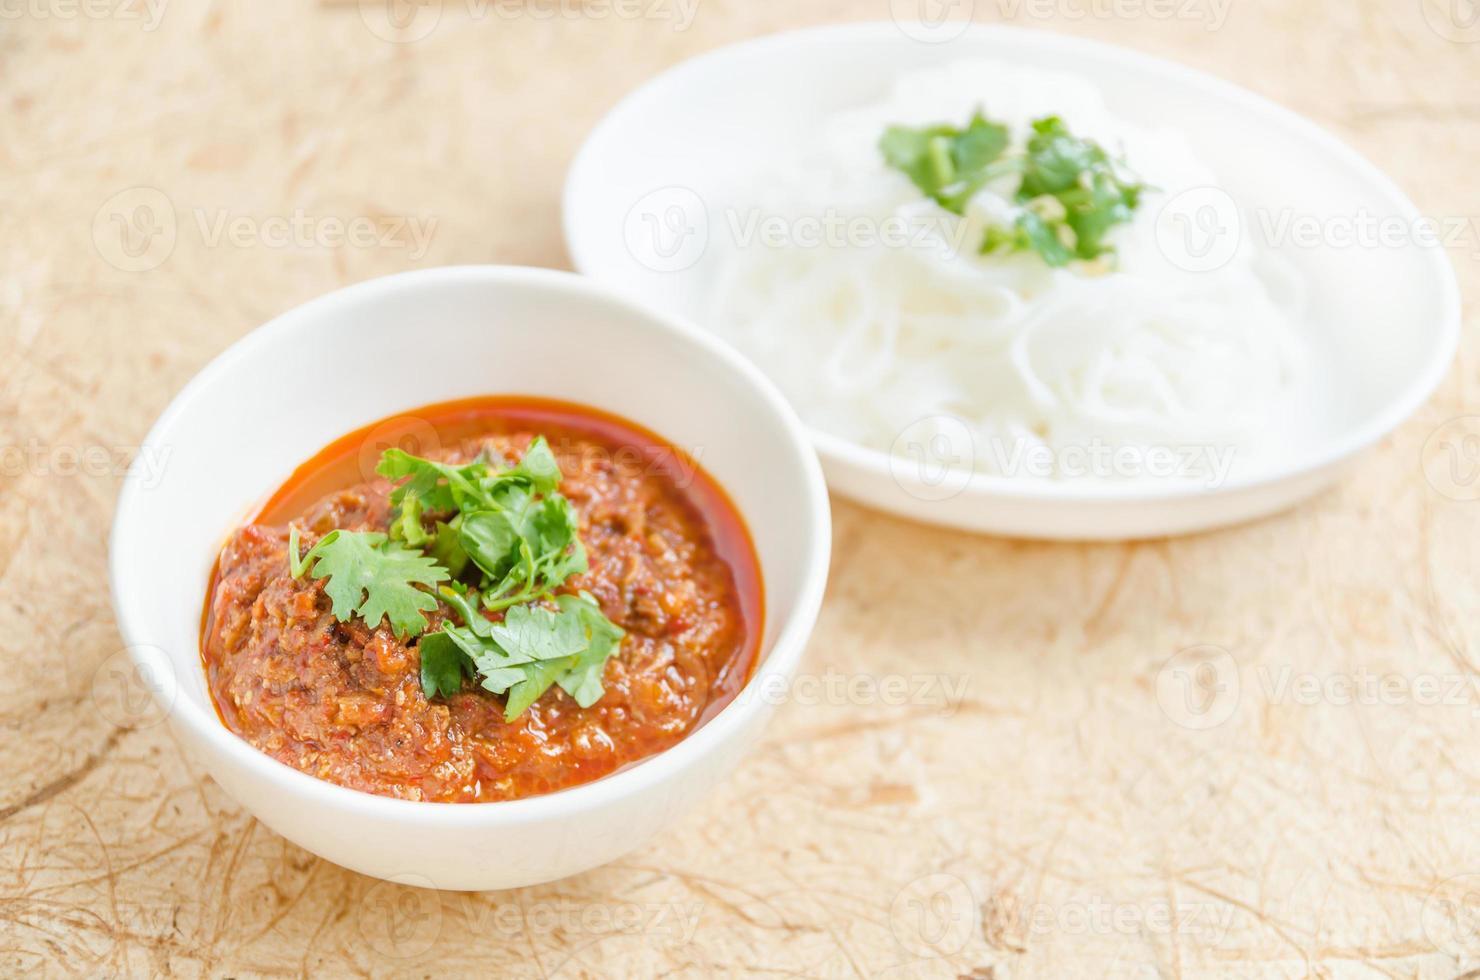 Thaise vermicelli gegeten met nam prik ong foto